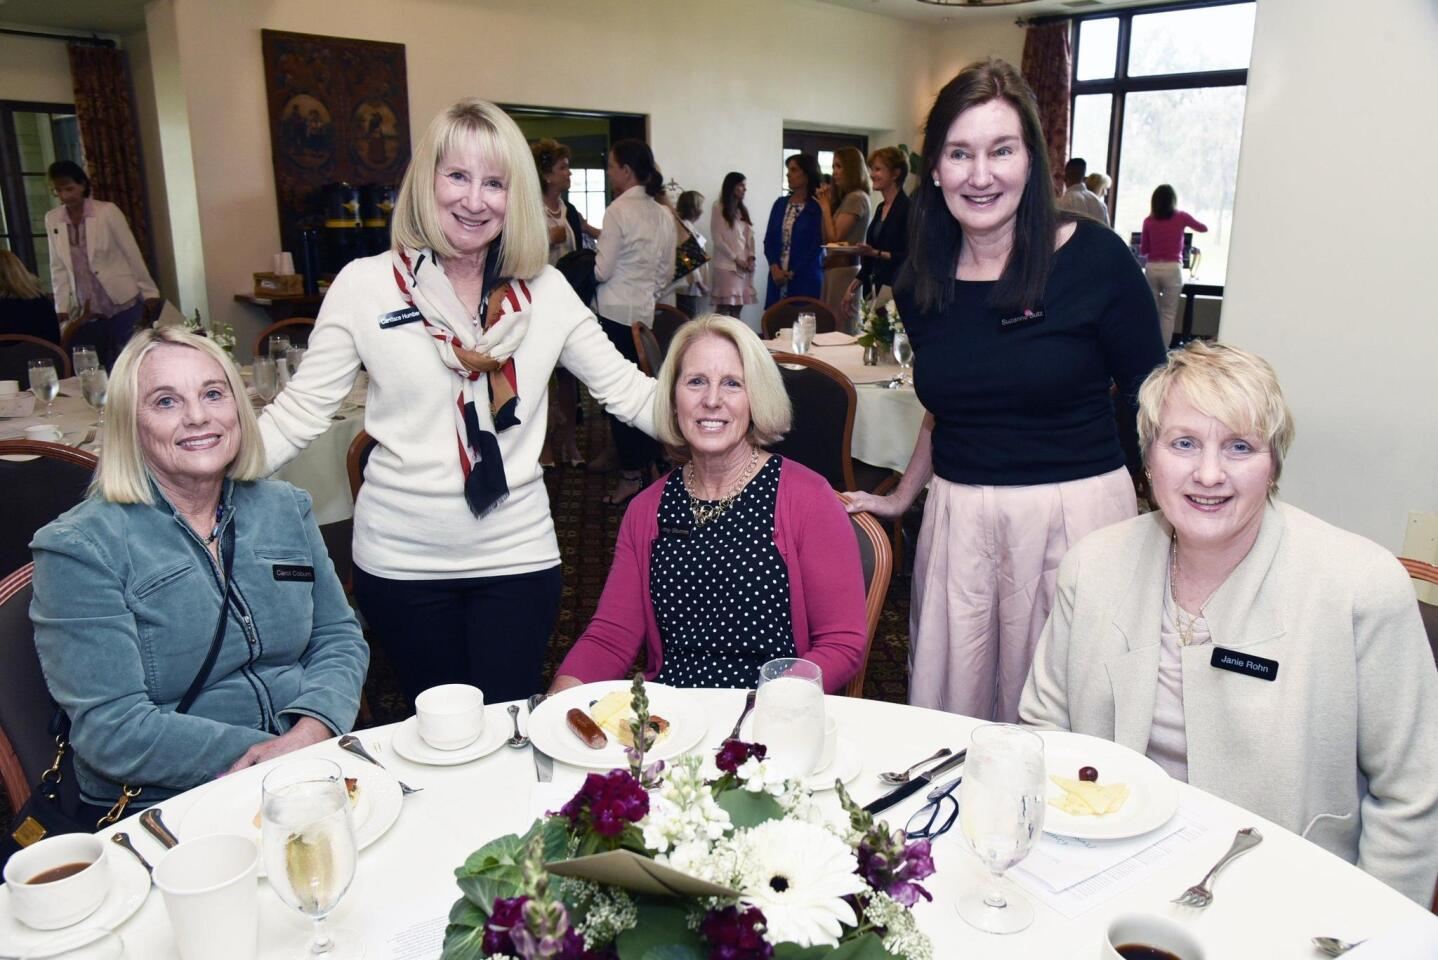 Standing: Candace Humber, Suzanne Butz. Seated: Carol Coburn, Kathy Stumm, Janie Rohn